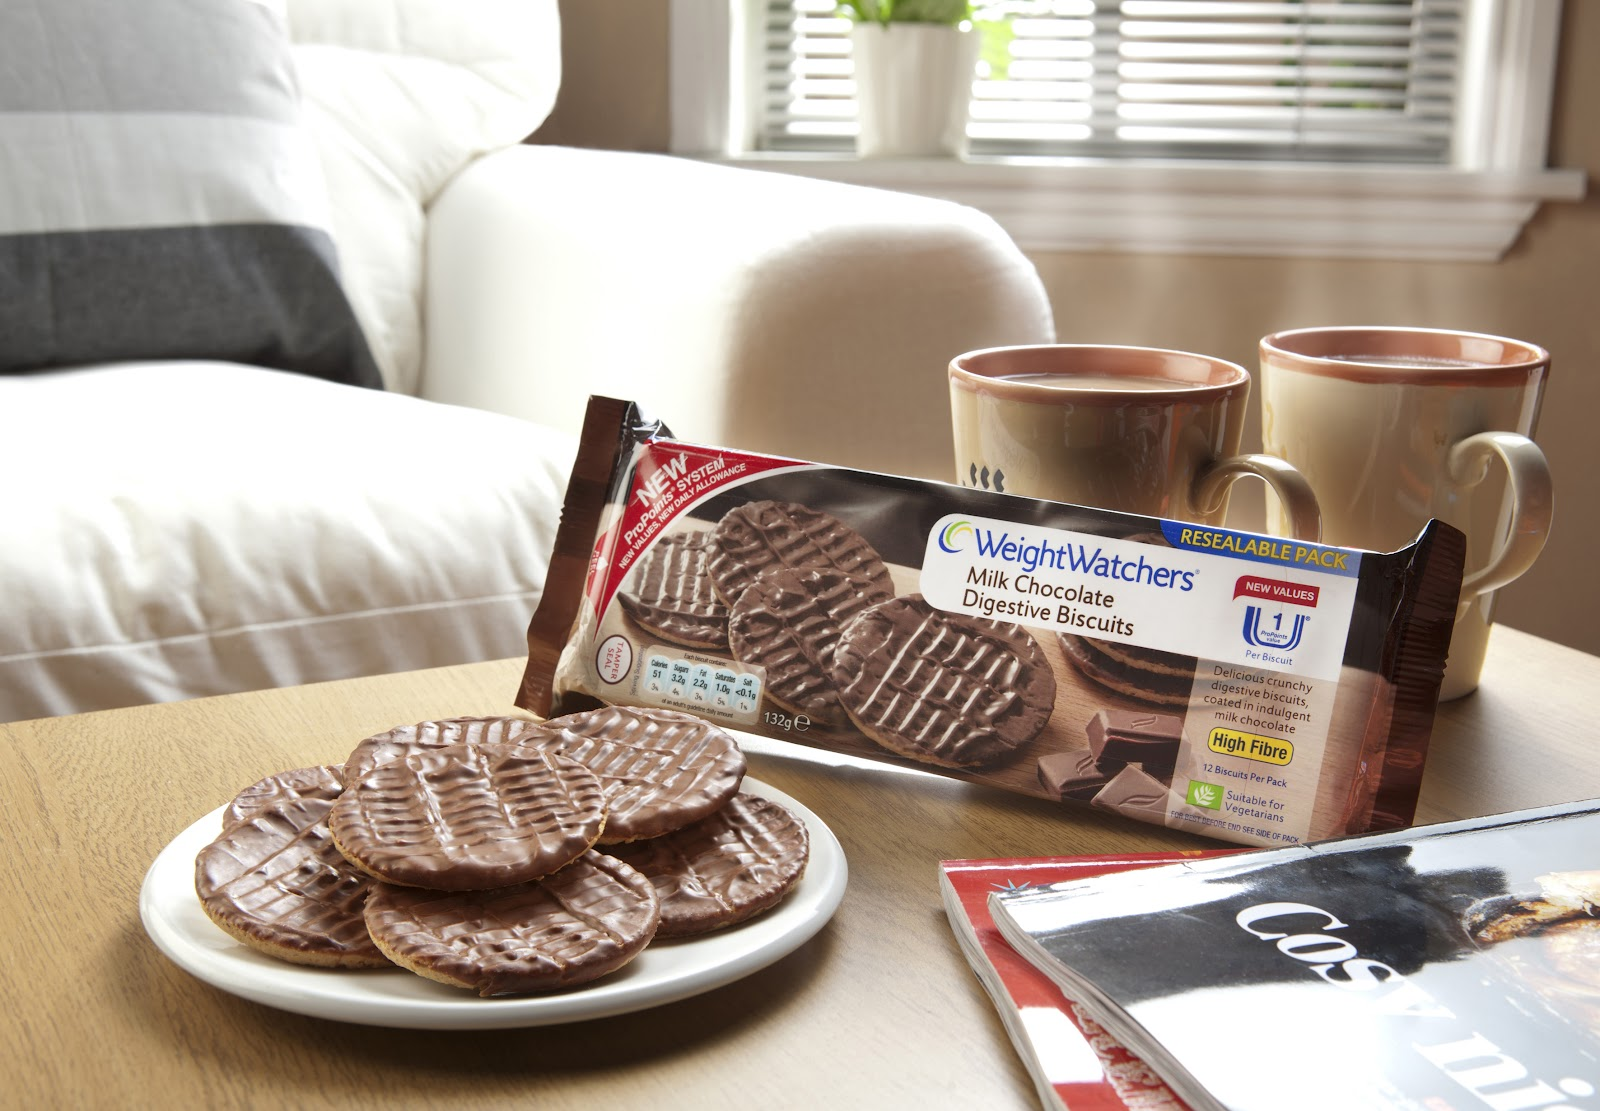 The World Of Chocolate Ww Milk Chocolate Digestive Biscuits